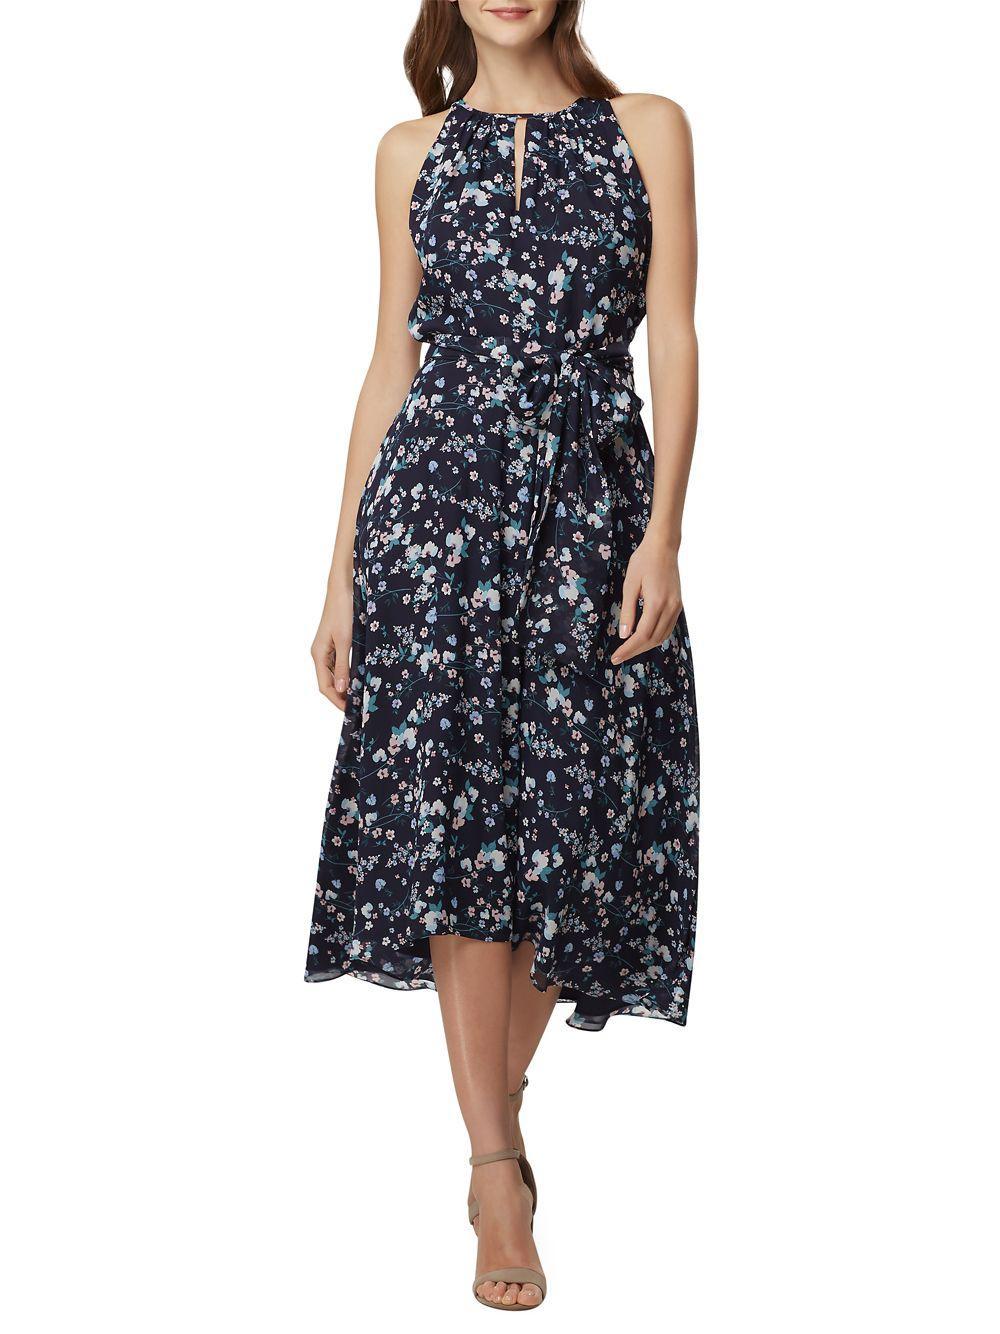 1a5b1af1dc0 Lyst - Tahari Floral Sleeveless A-line Dress in Blue